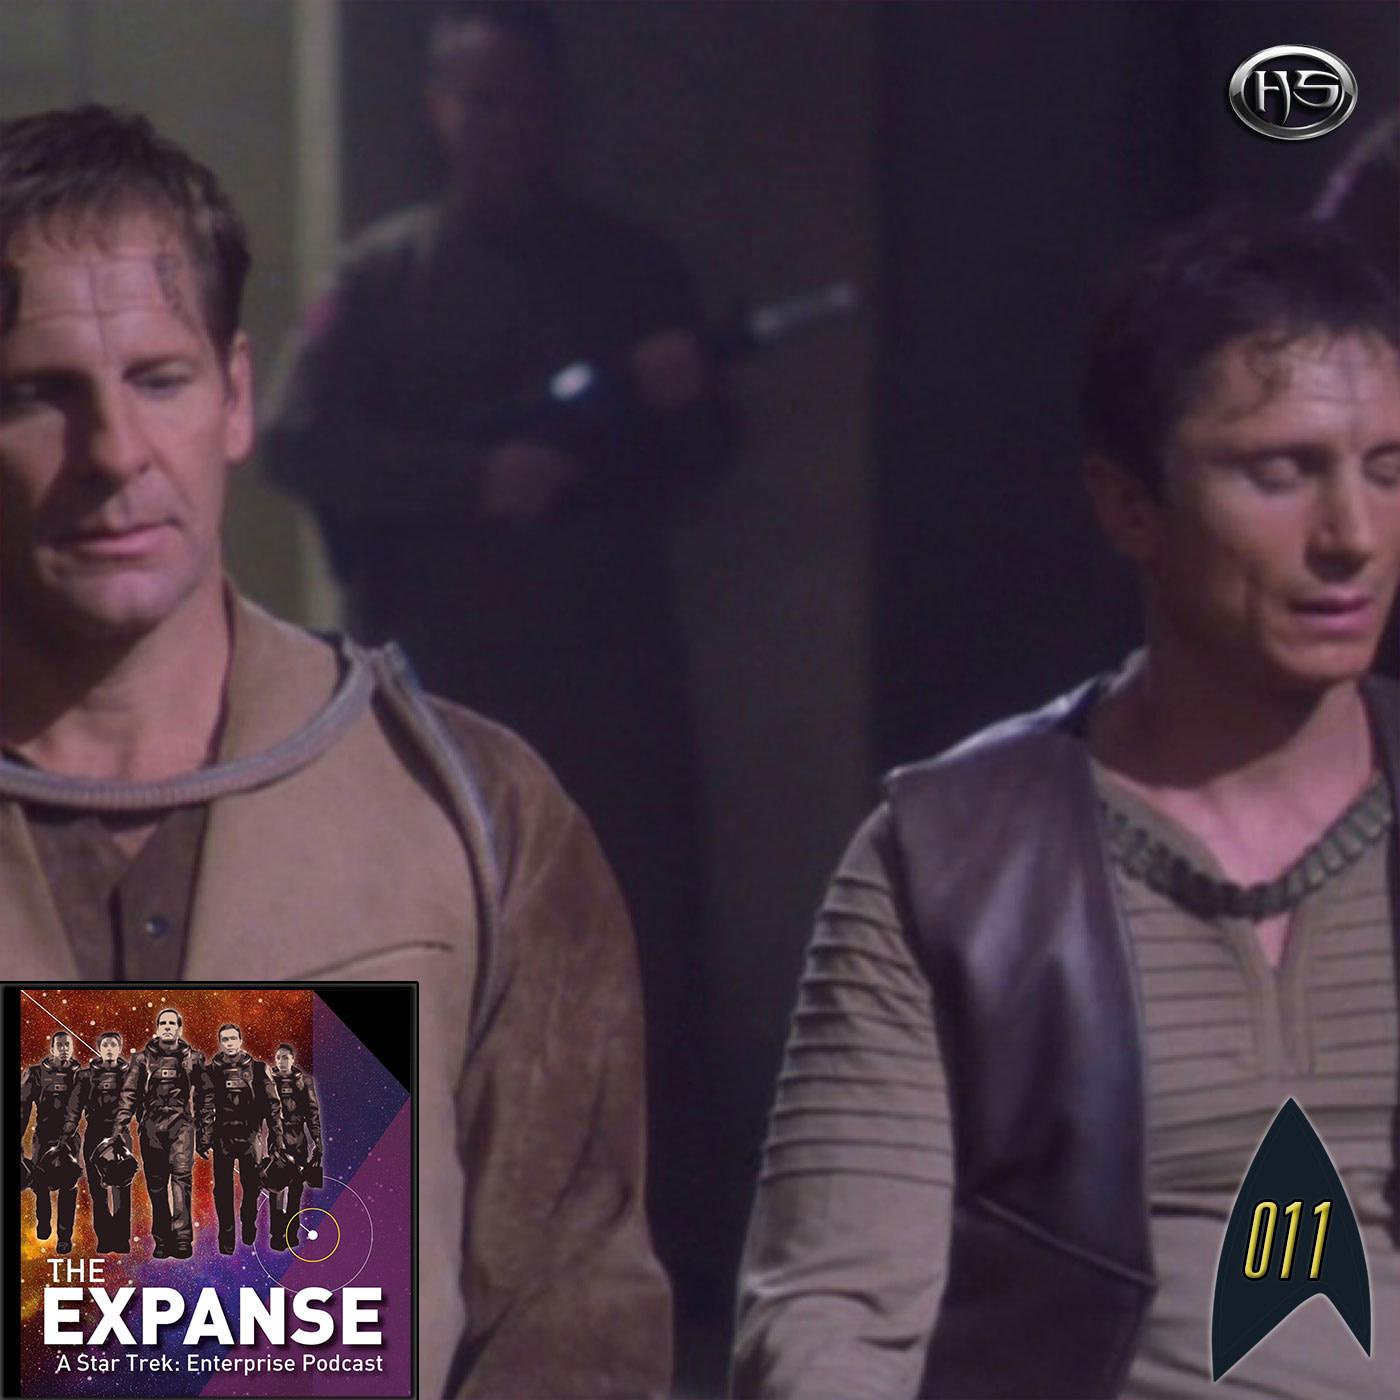 The Expanse Episode 11